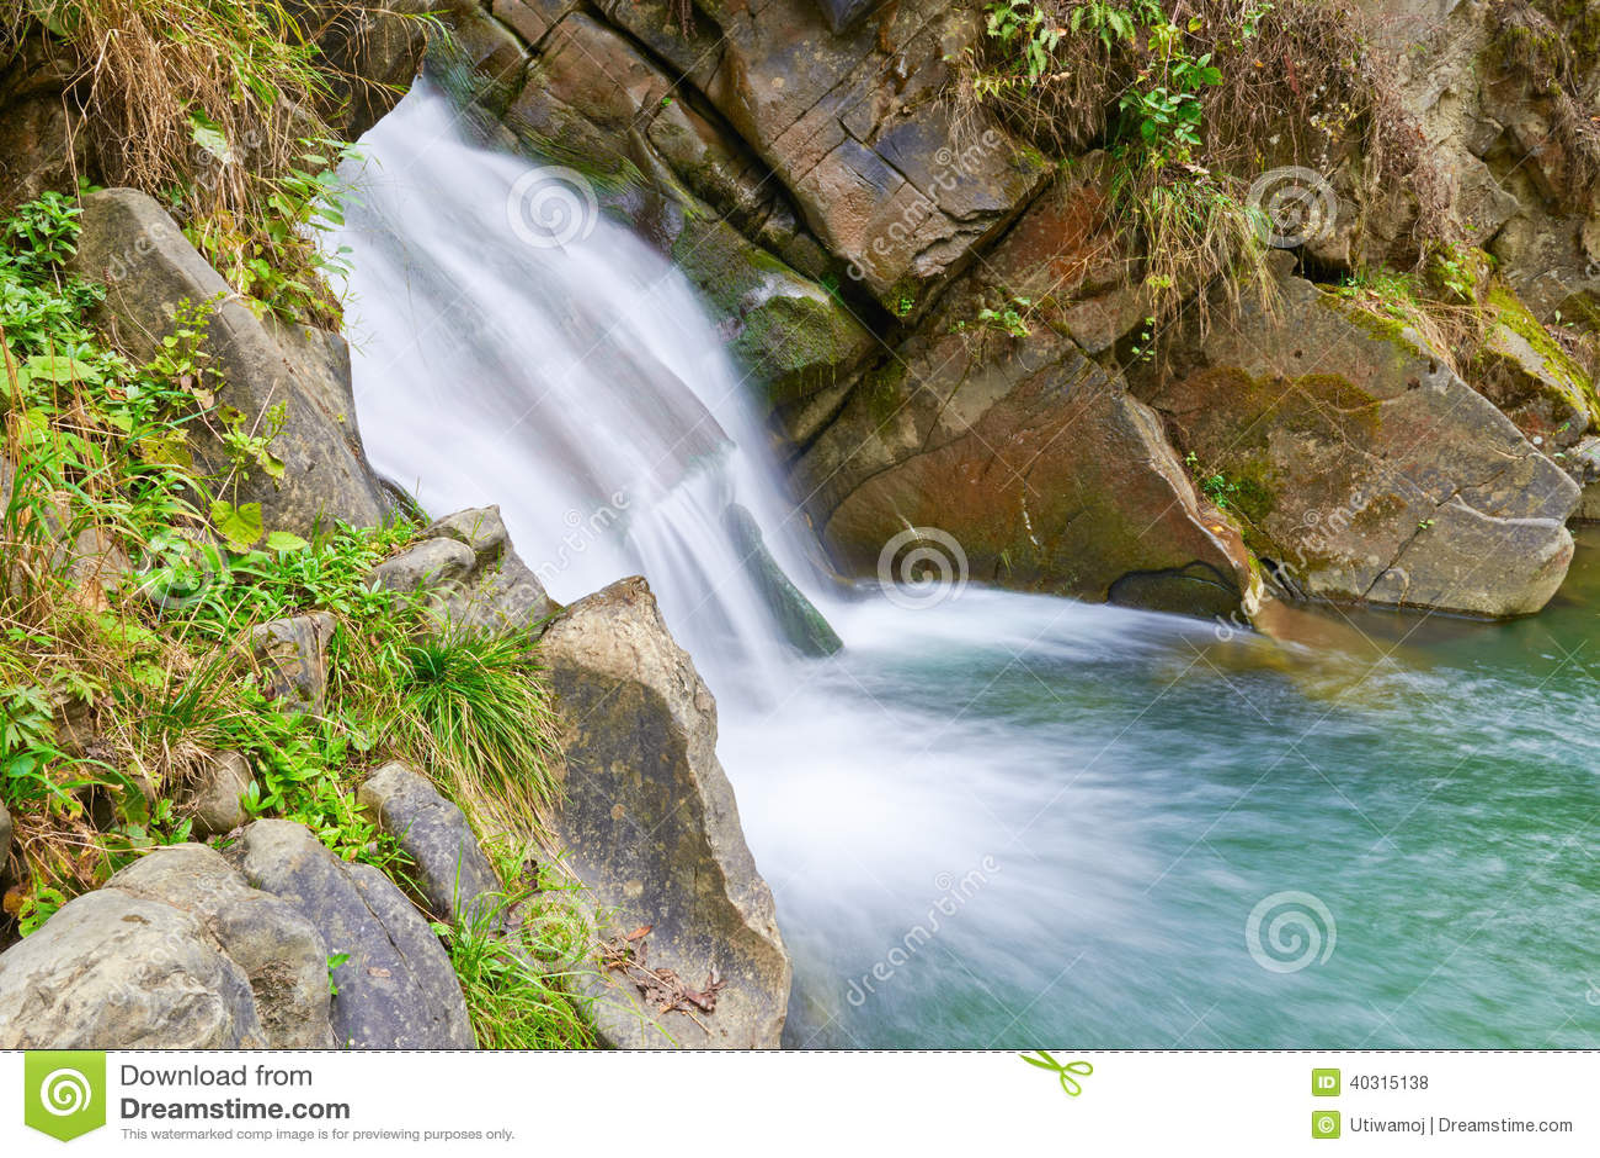 La cascada de zaskalnik fuente natural de agua foto de for Fuente cascada agua